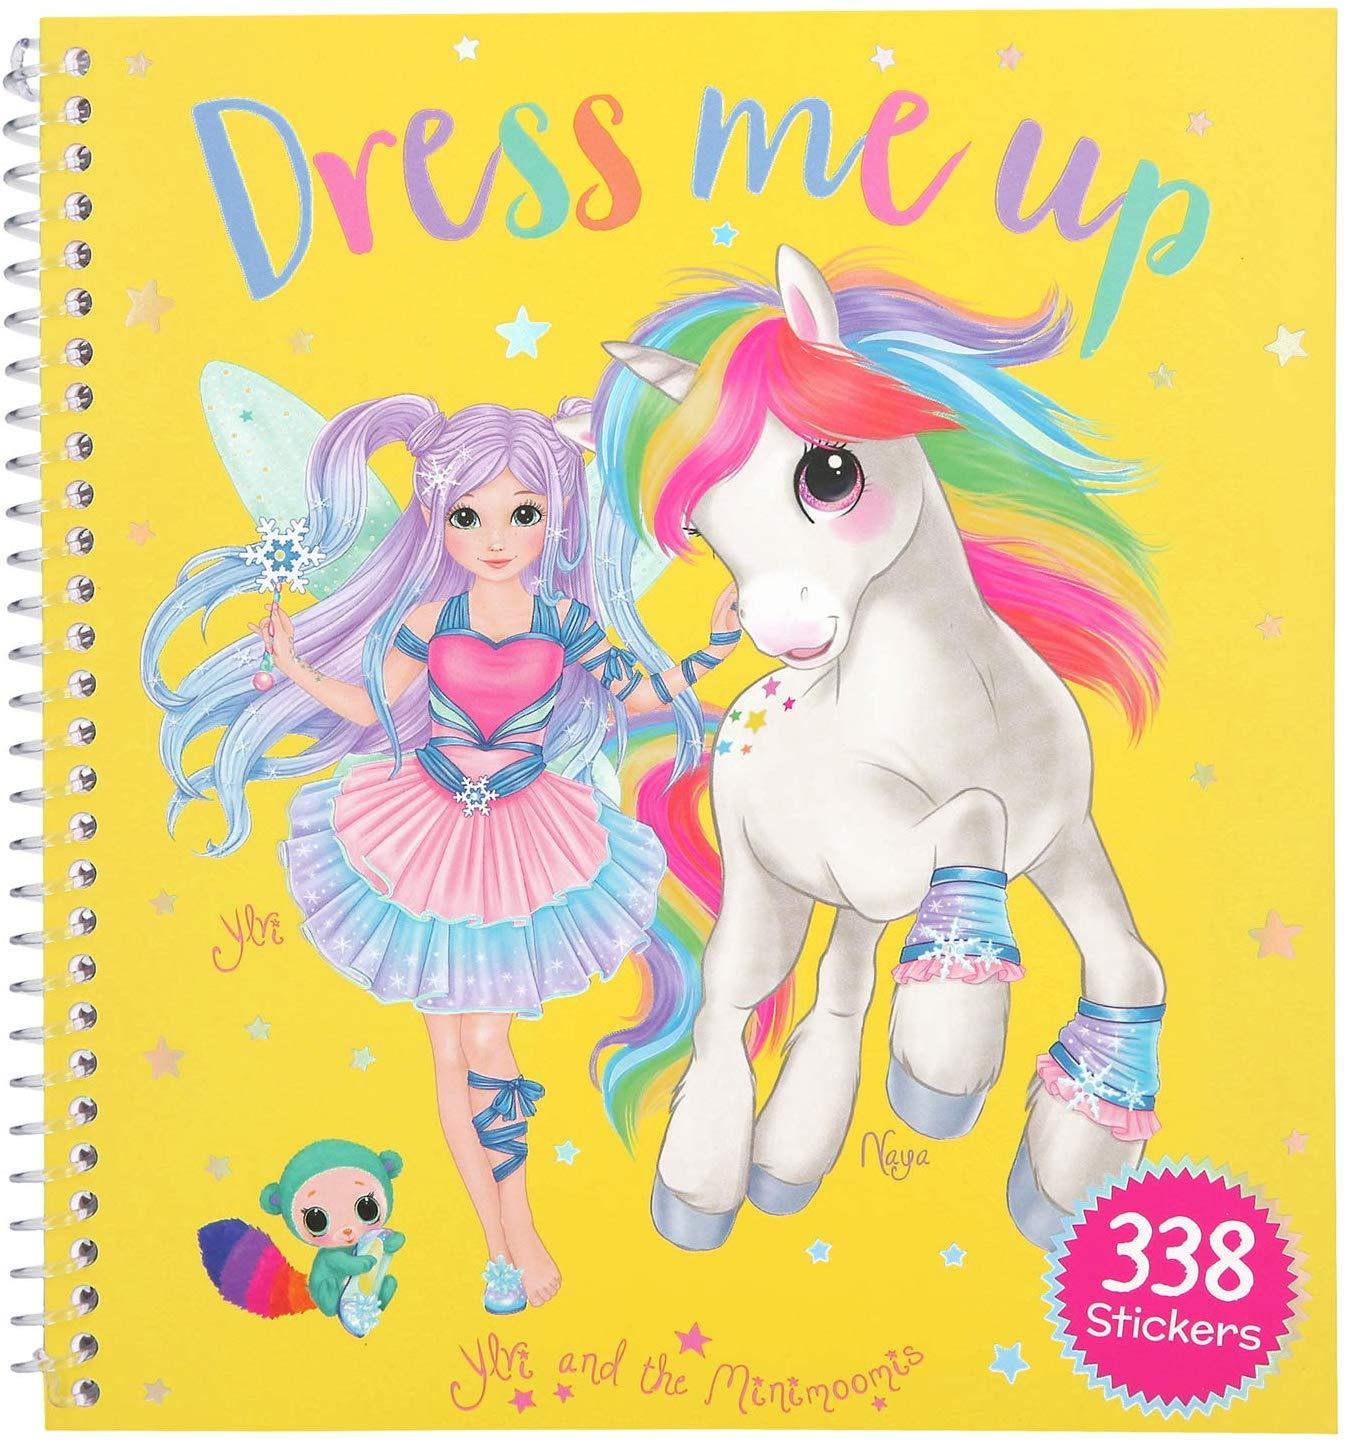 Ylvi & the Minimoomis - Dress me up Sticker Fun (410832)